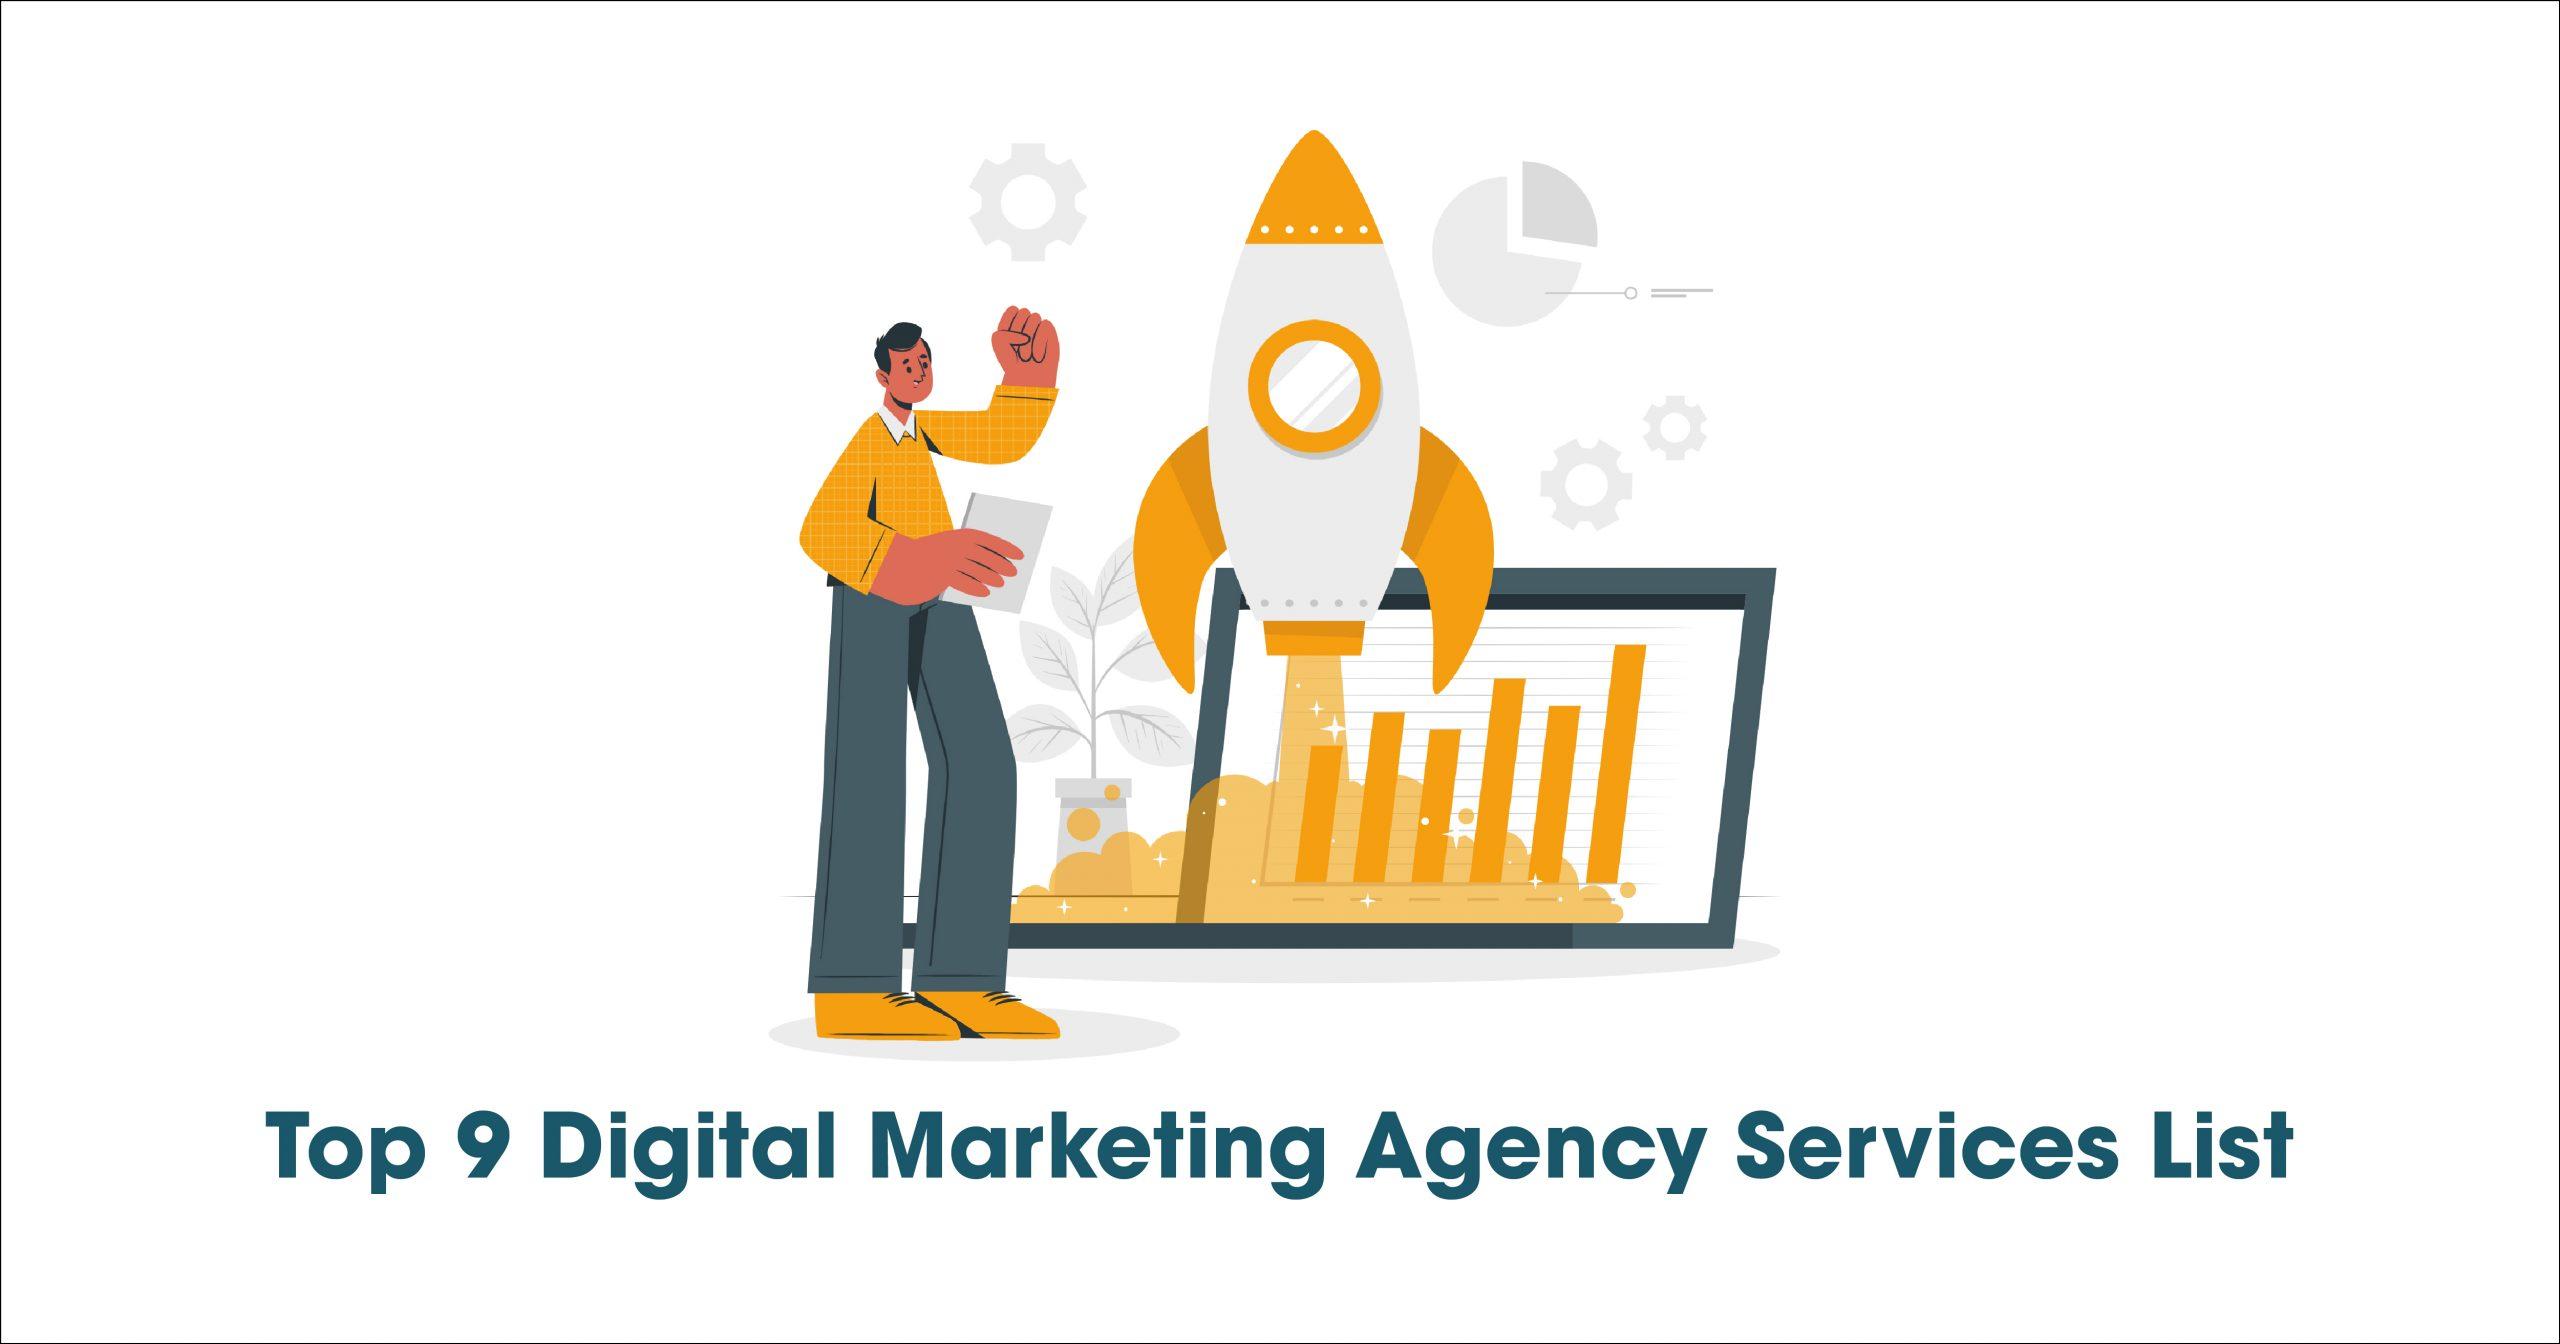 Top 9 Digital Marketing Agency Services List